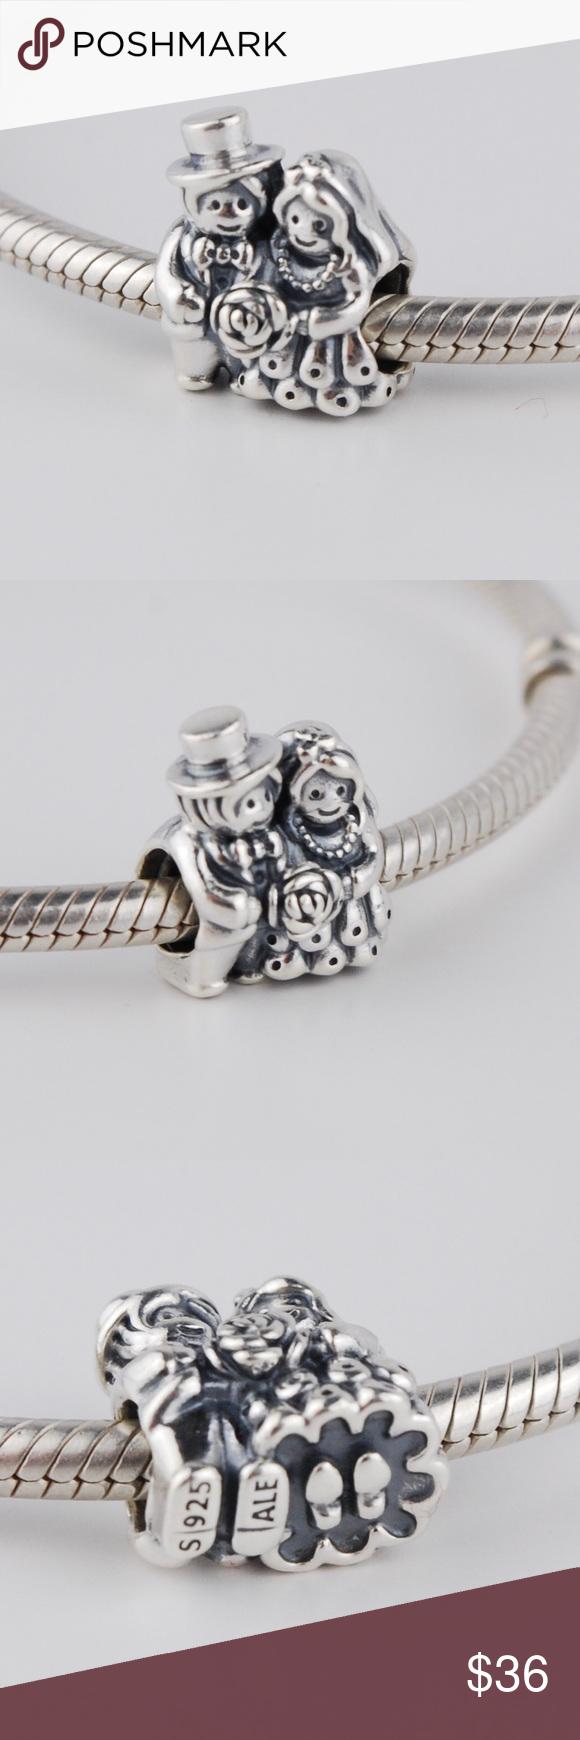 f38fd92bb PANDORA Mr. & Mrs. Bride & Groom Wedding Charm Authentic PANDORA Sterling  Silver Mr